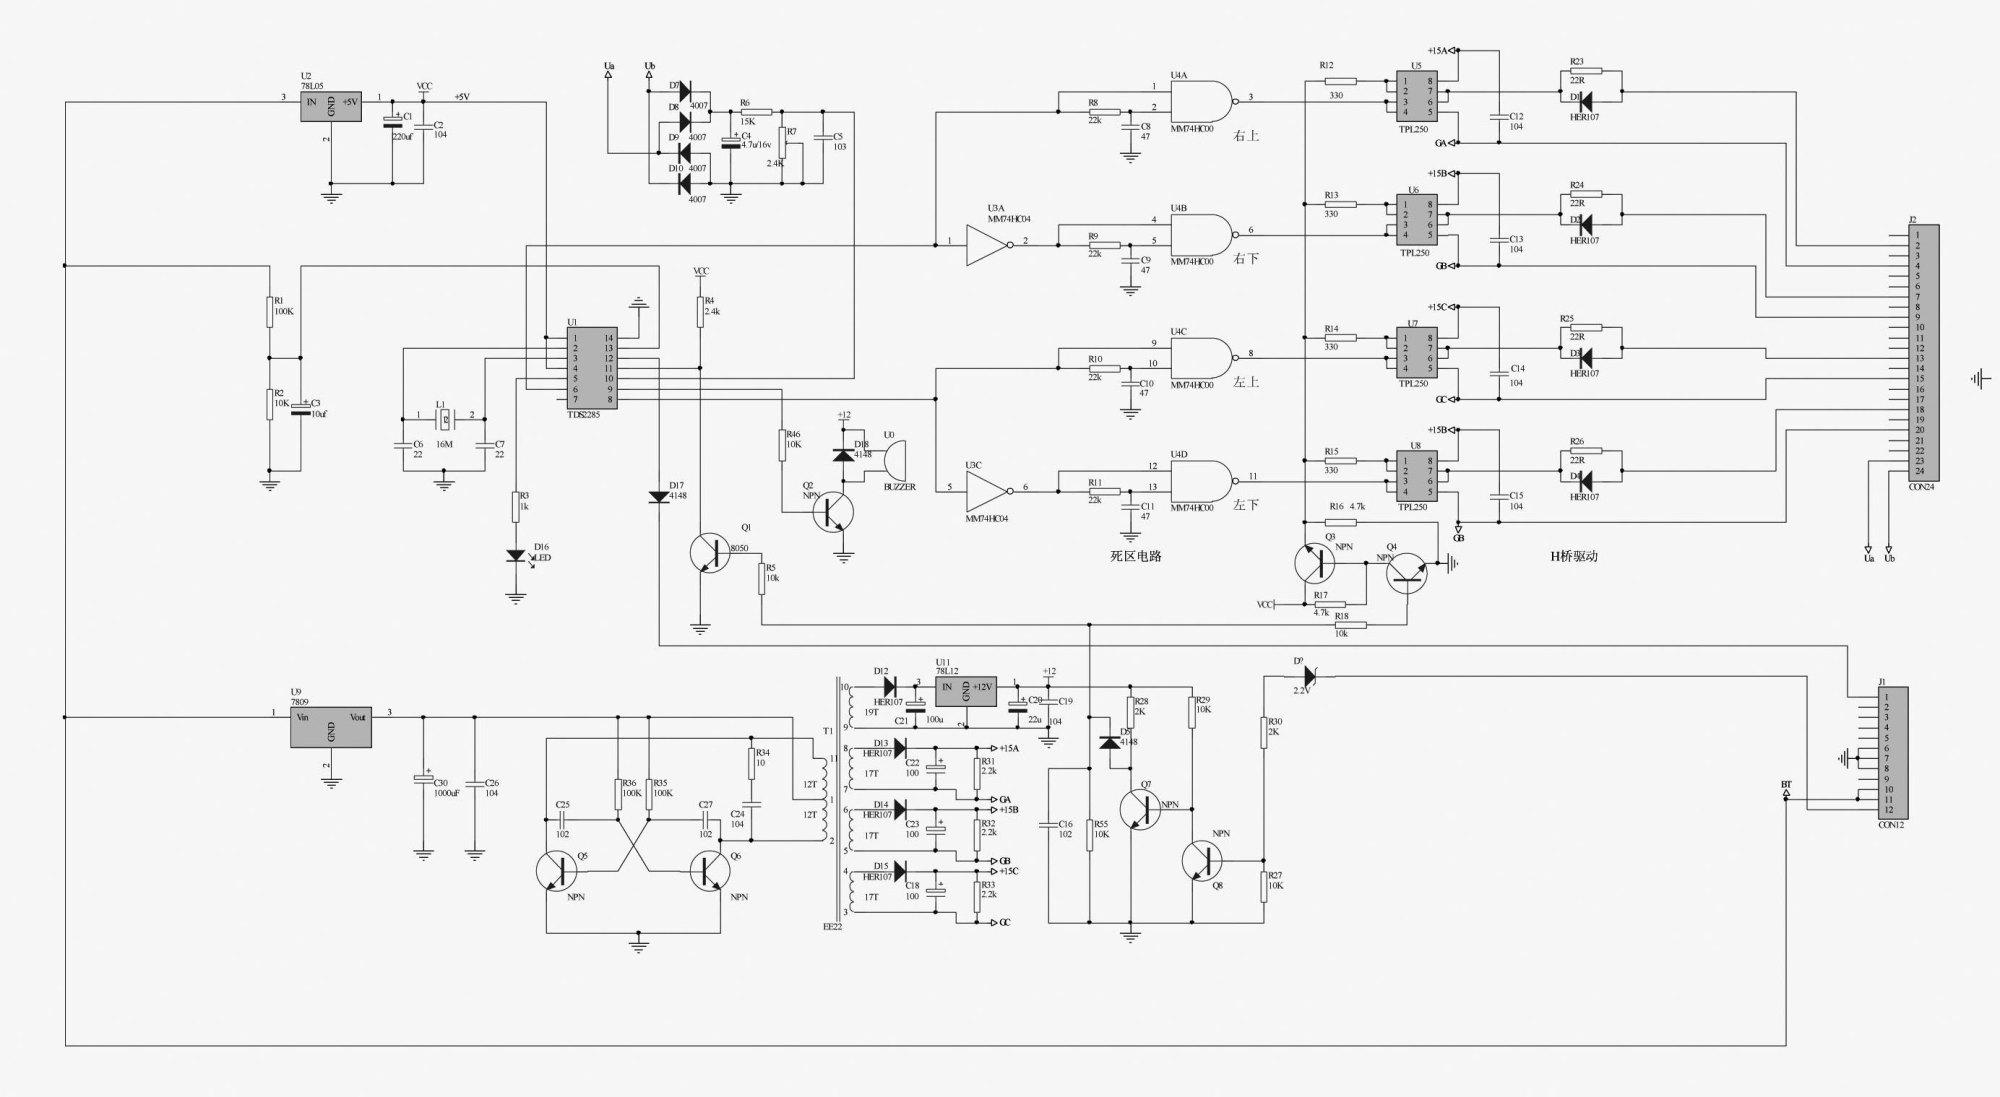 hight resolution of 1000w 12v dc home power inverter circuit board design 1000w power inverter spwm driven circuit diagram